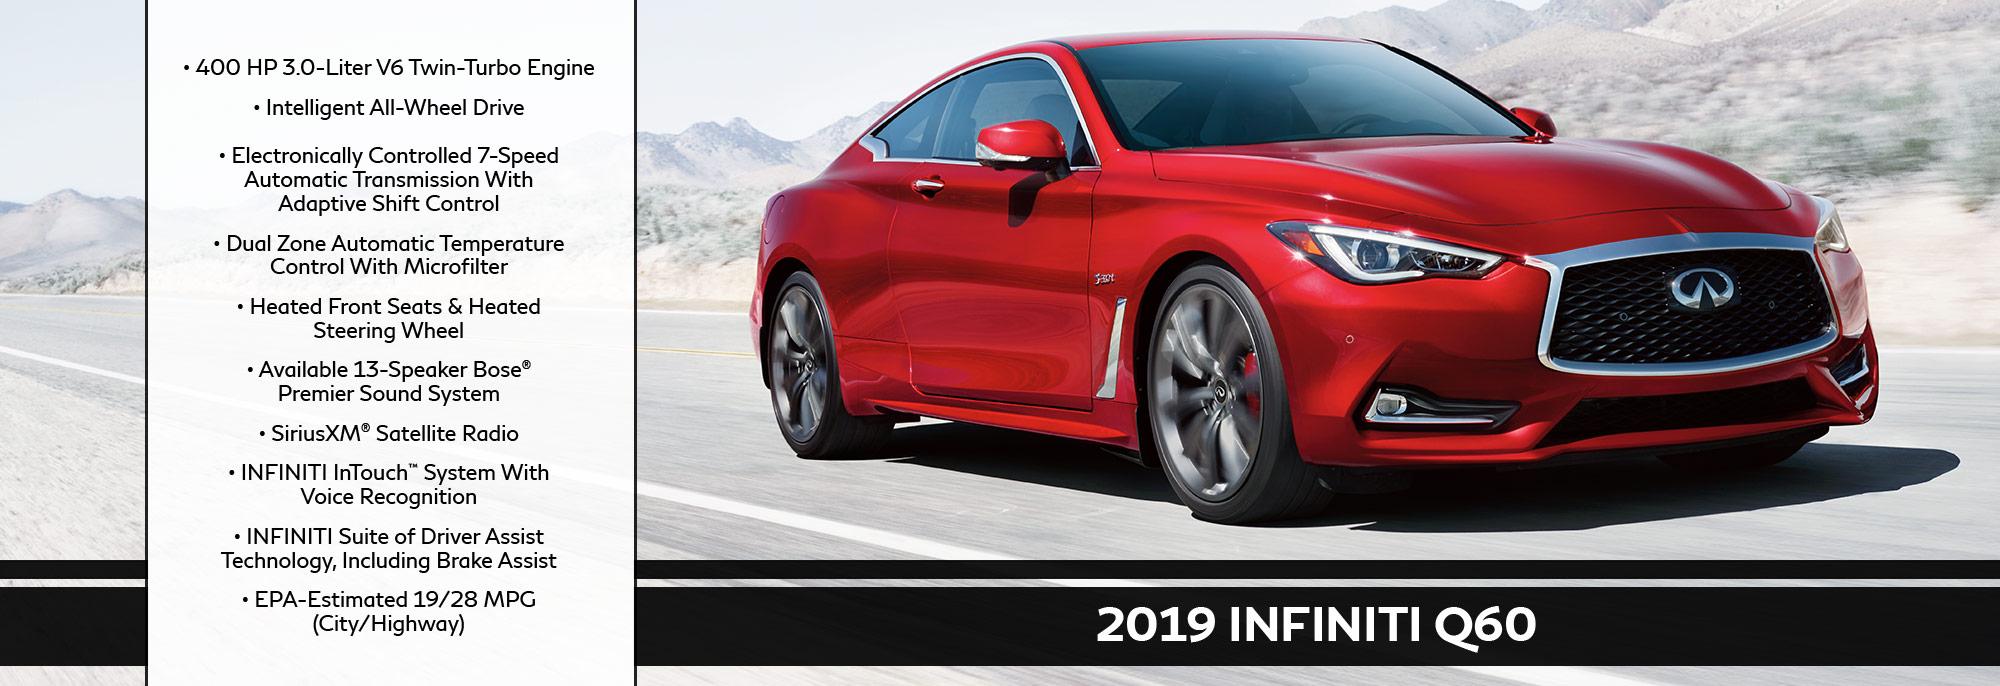 New 2019 INFINITI Q60 Offer